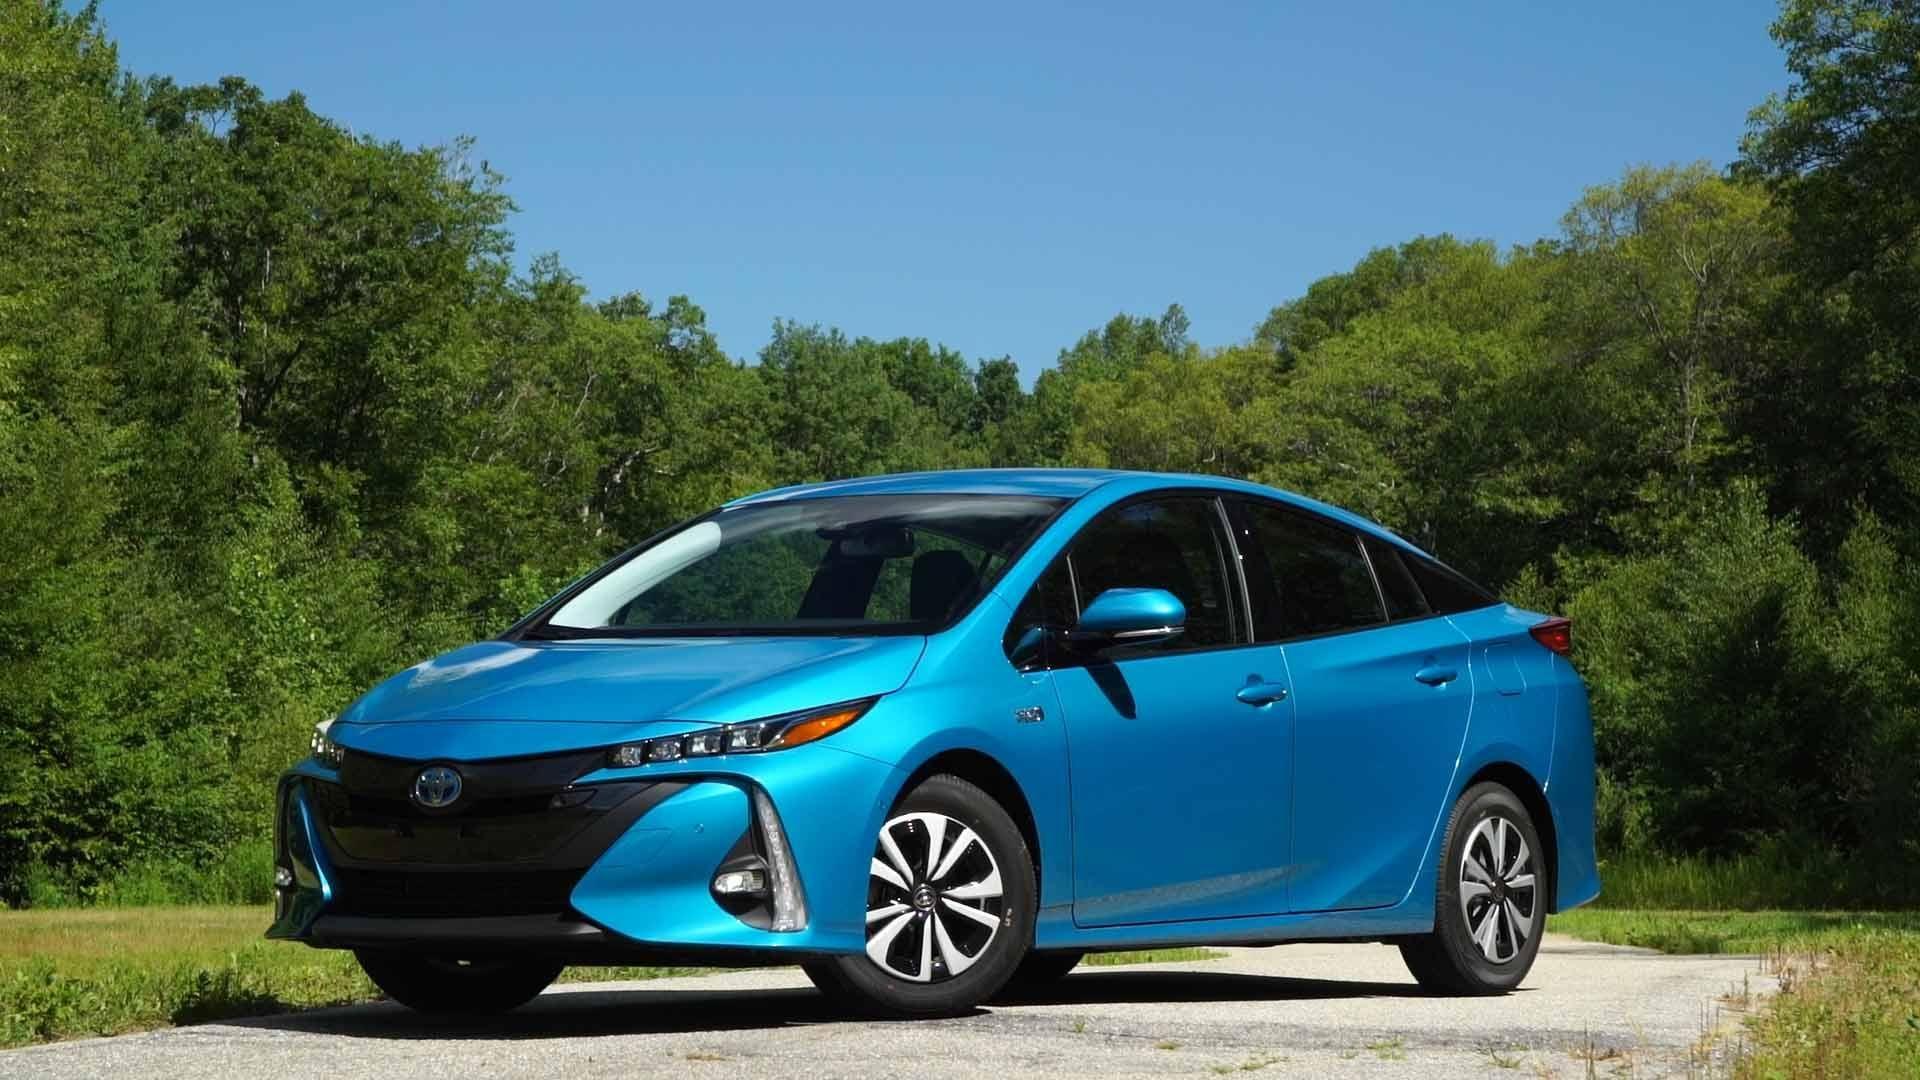 2017 Toyota Prius Prime First Drive Toyota prius, Toyota